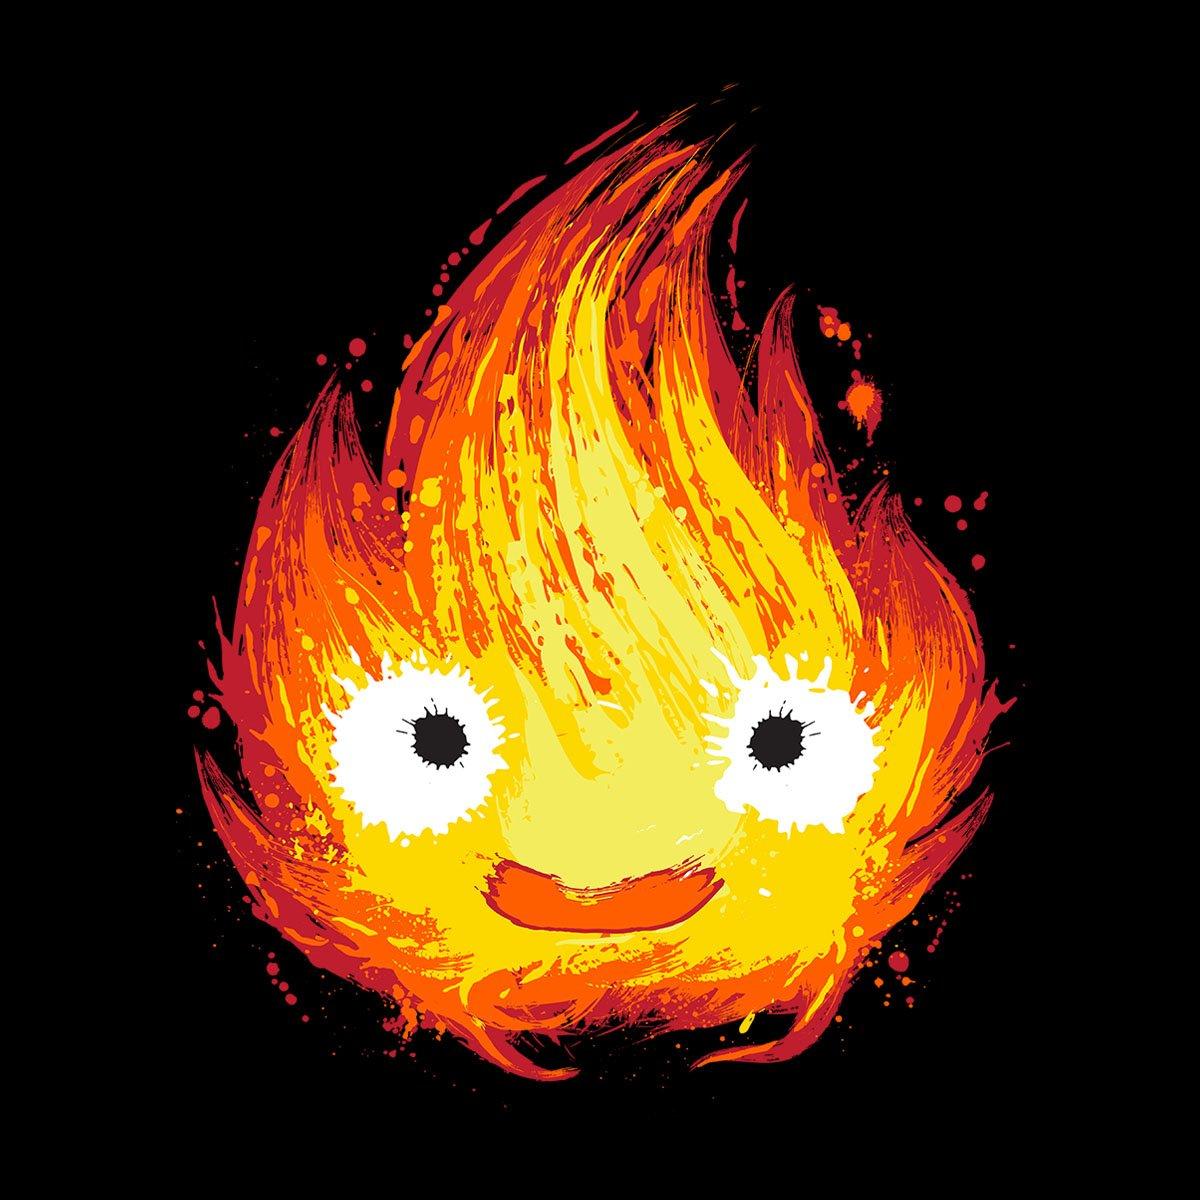 Cloud City 7 Howls Moving Castle Fire Demon Womens Hooded Sweatshirt